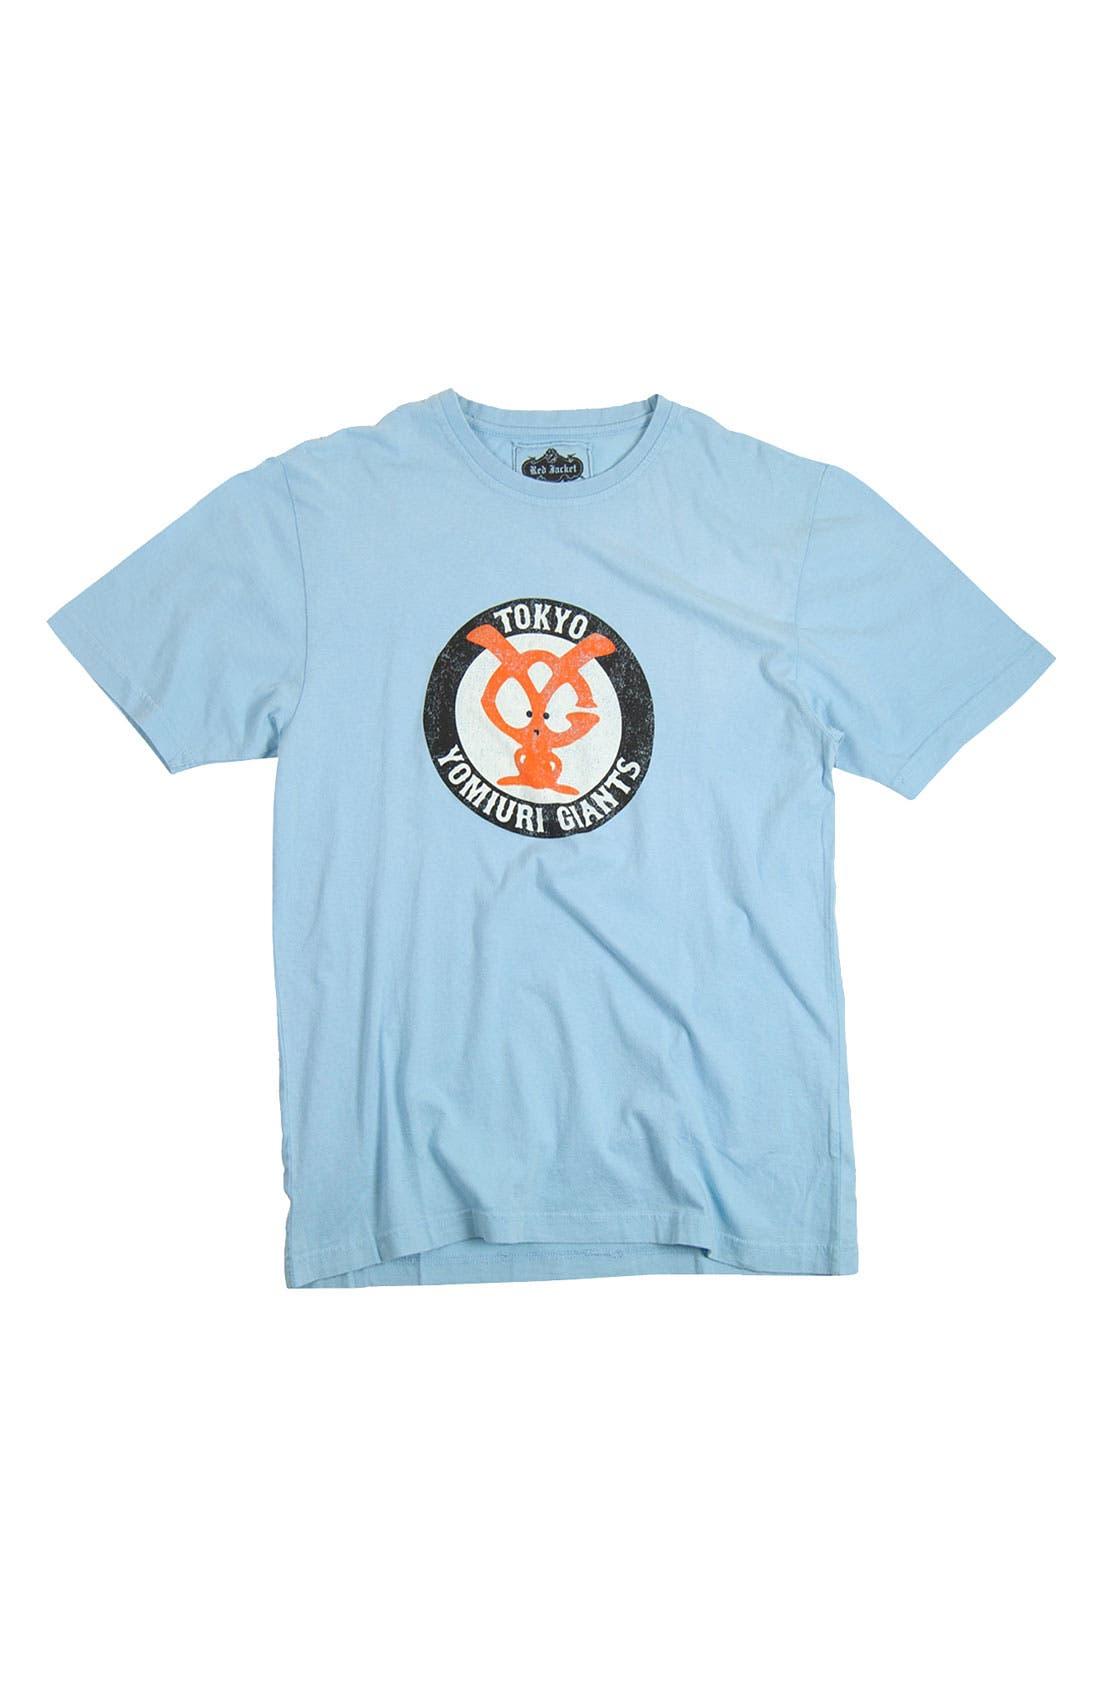 'Tokyo Yomiuri Giants' Trim Fit T-Shirt,                             Alternate thumbnail 4, color,                             458